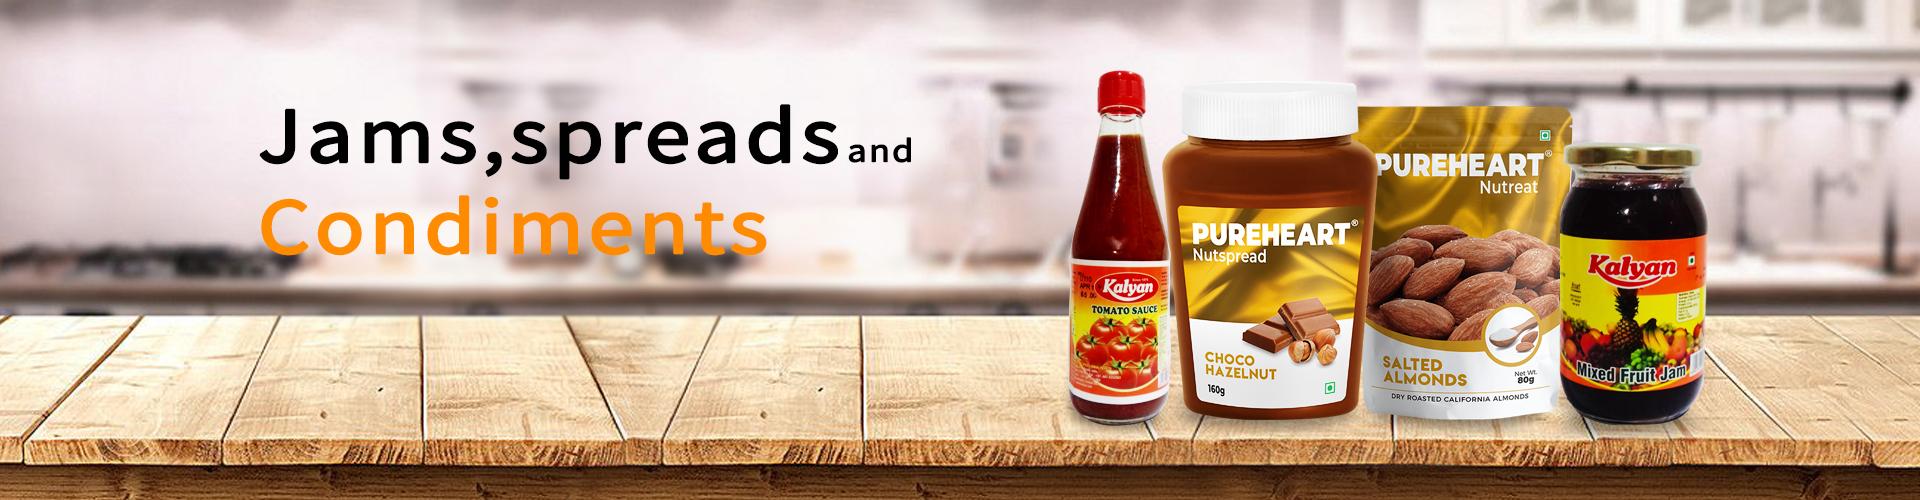 Jams, Spreads & Condiments